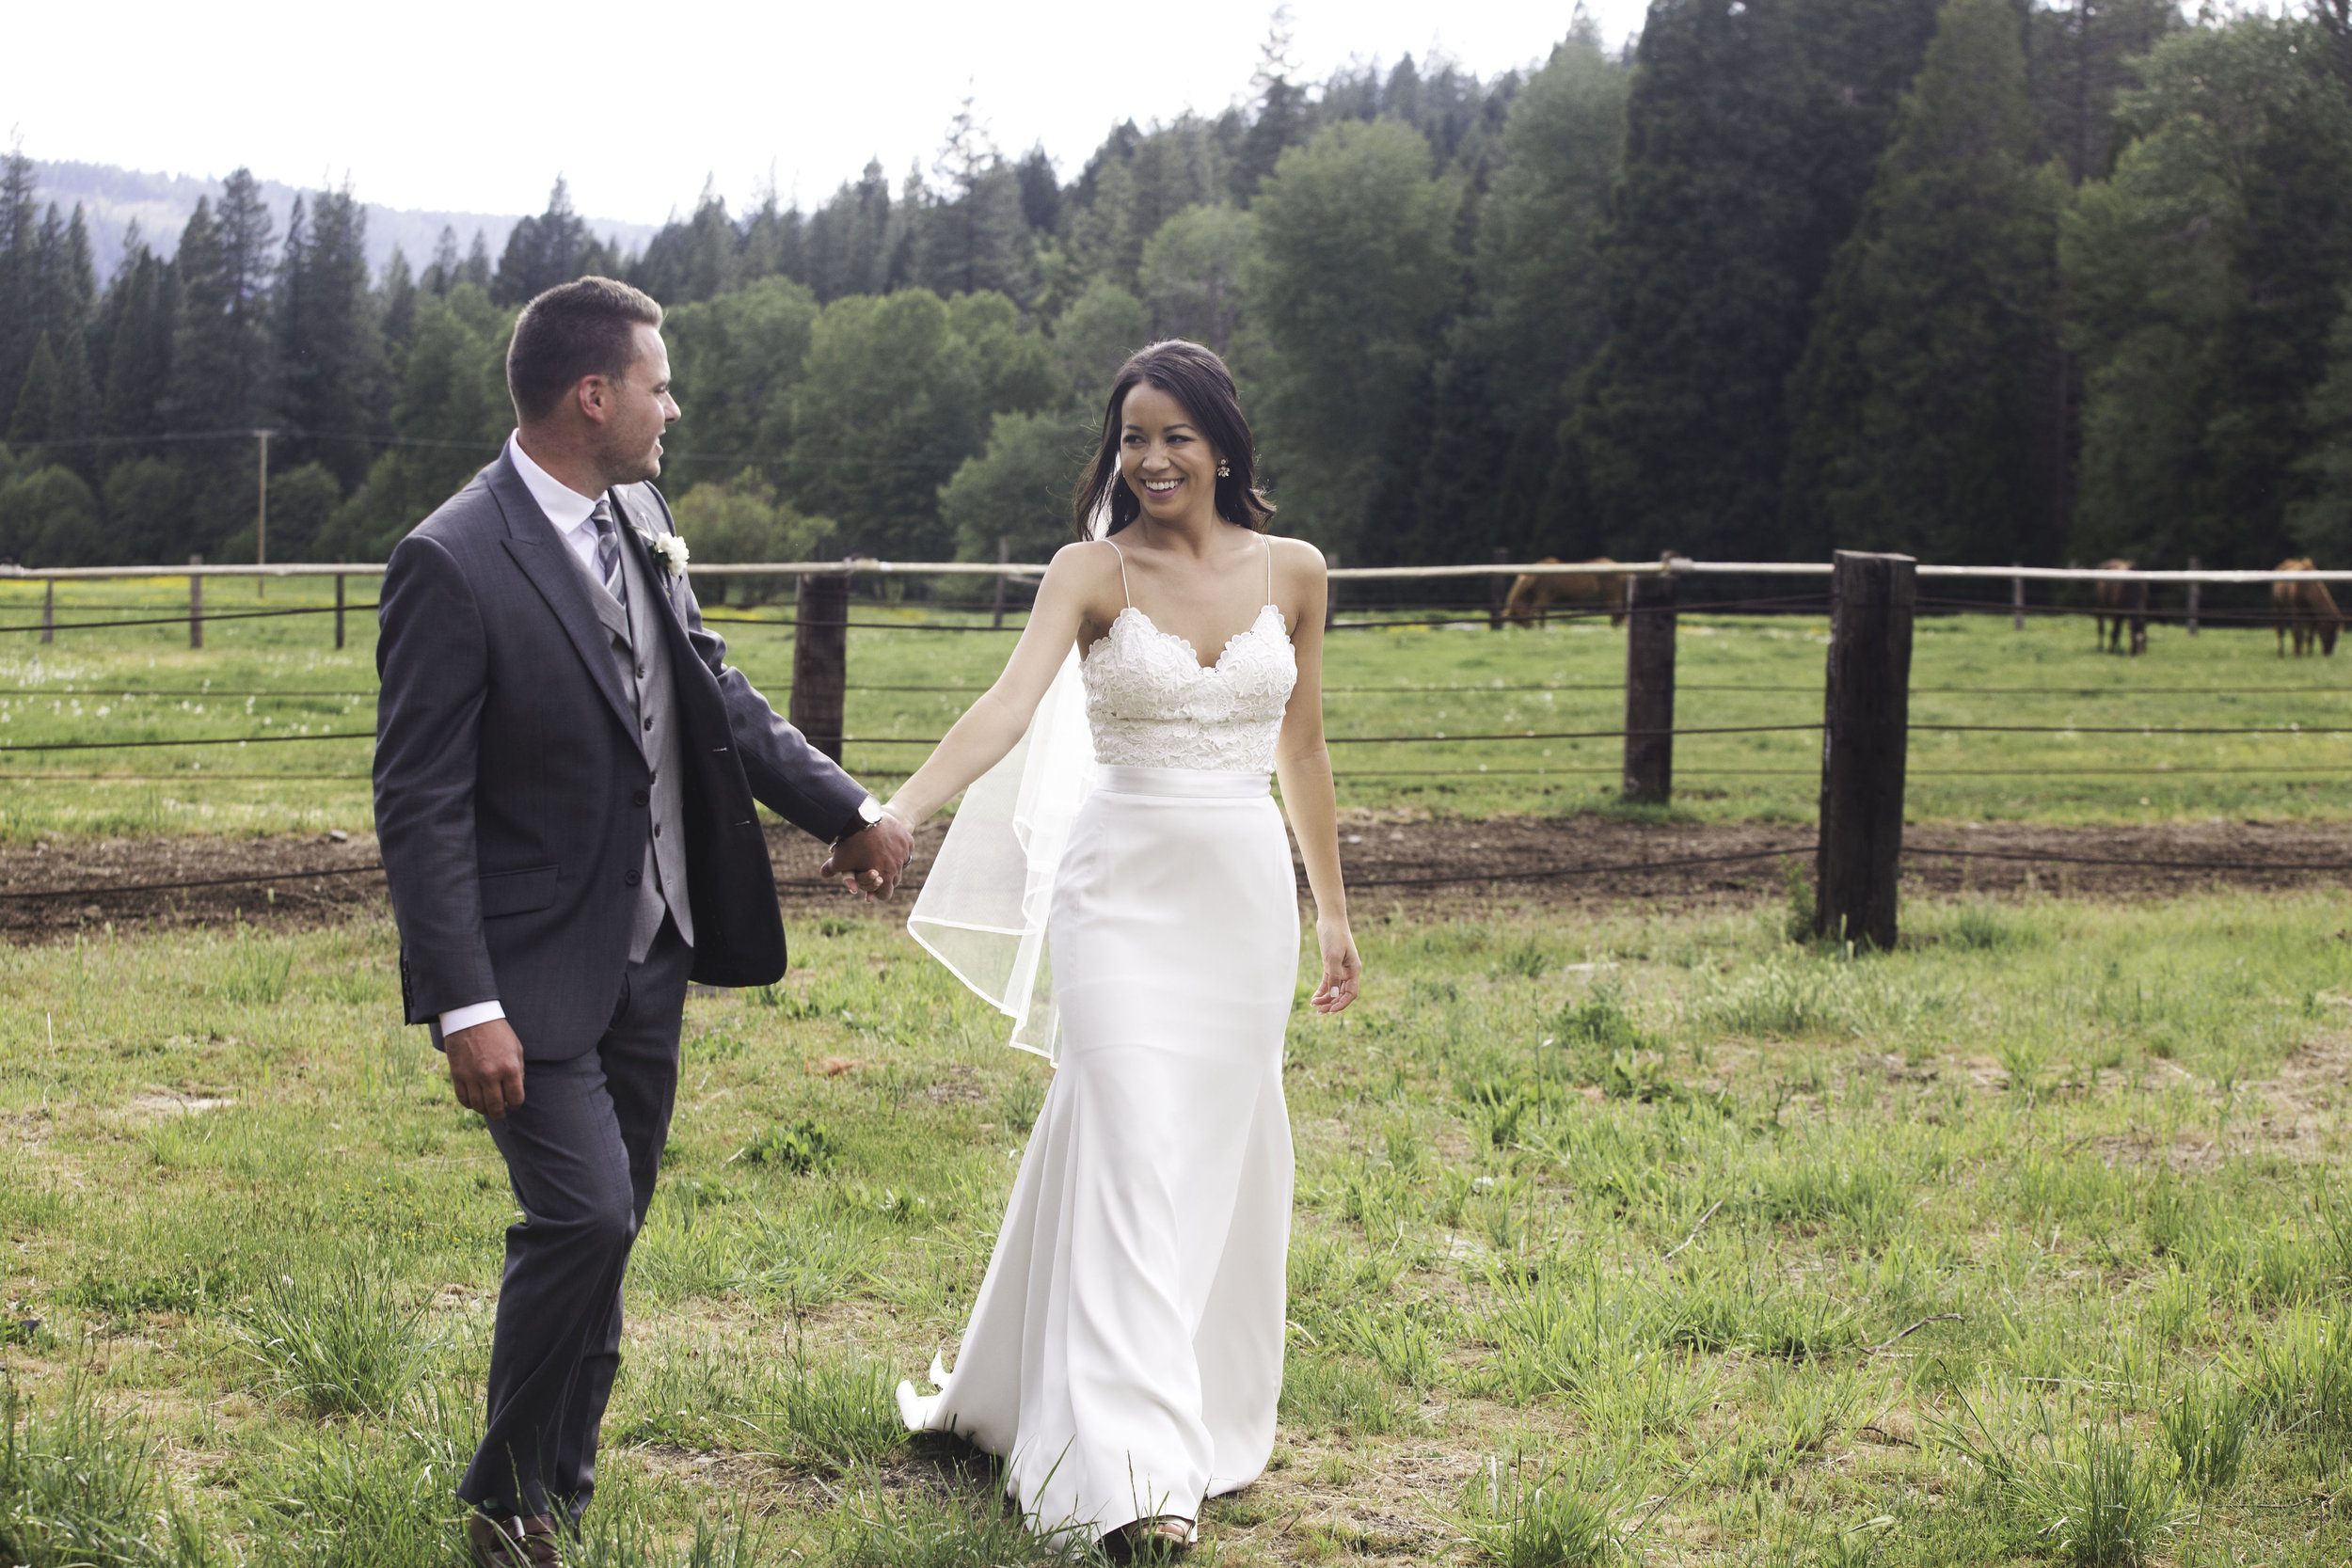 Best place for a destination wedding